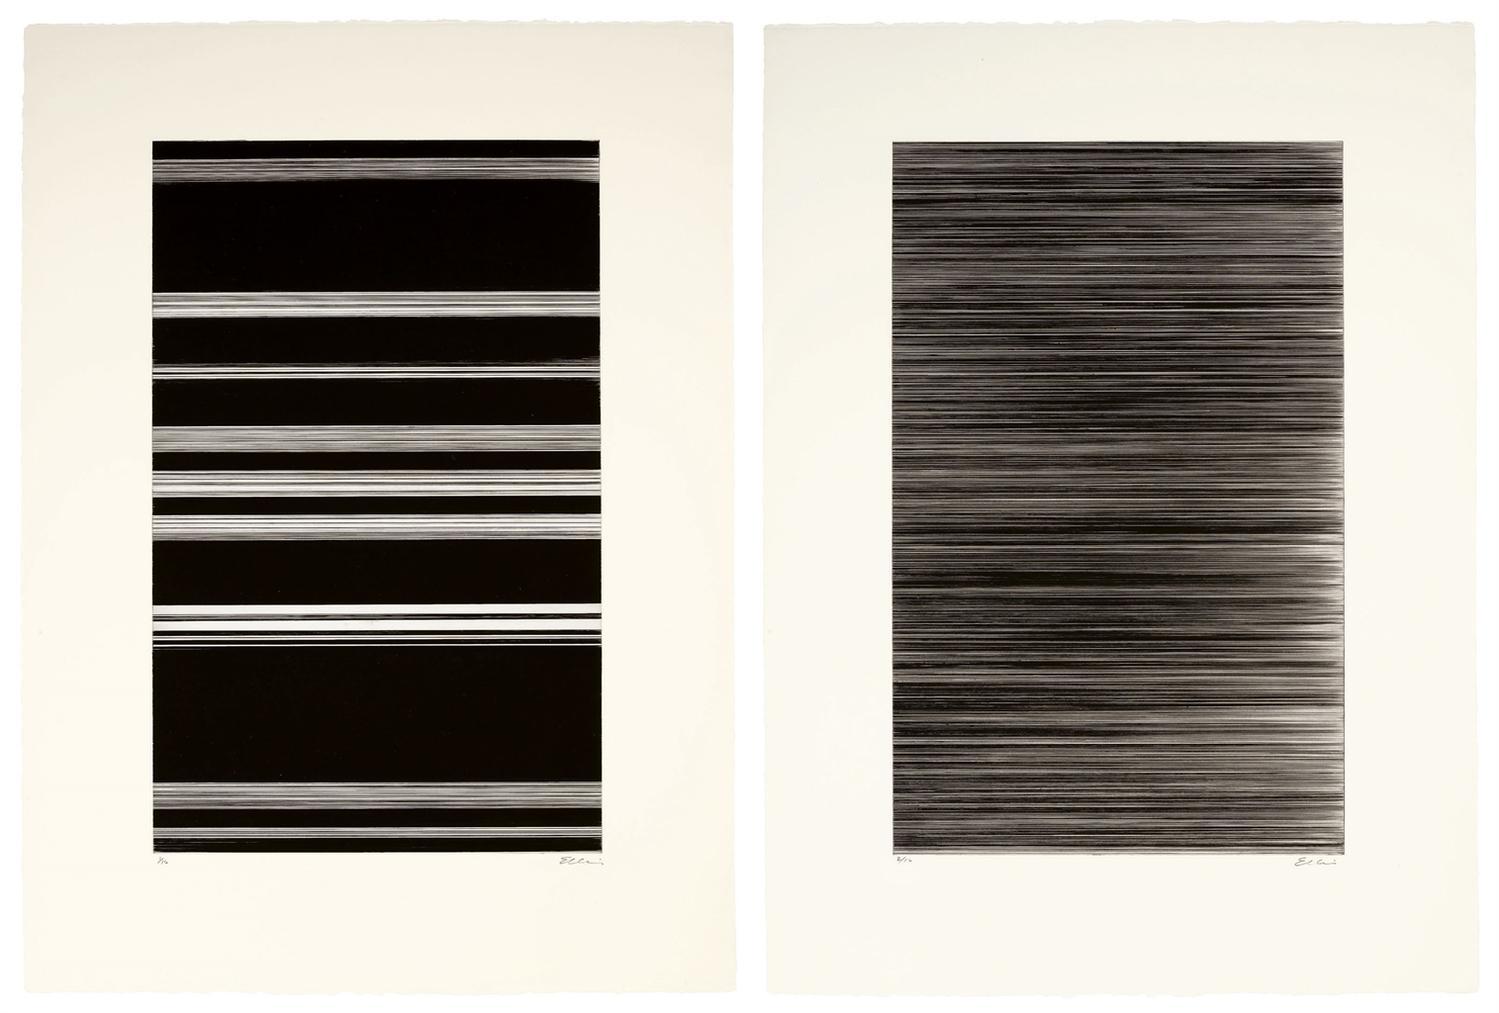 Stephen Ellis - Helgoland-1995